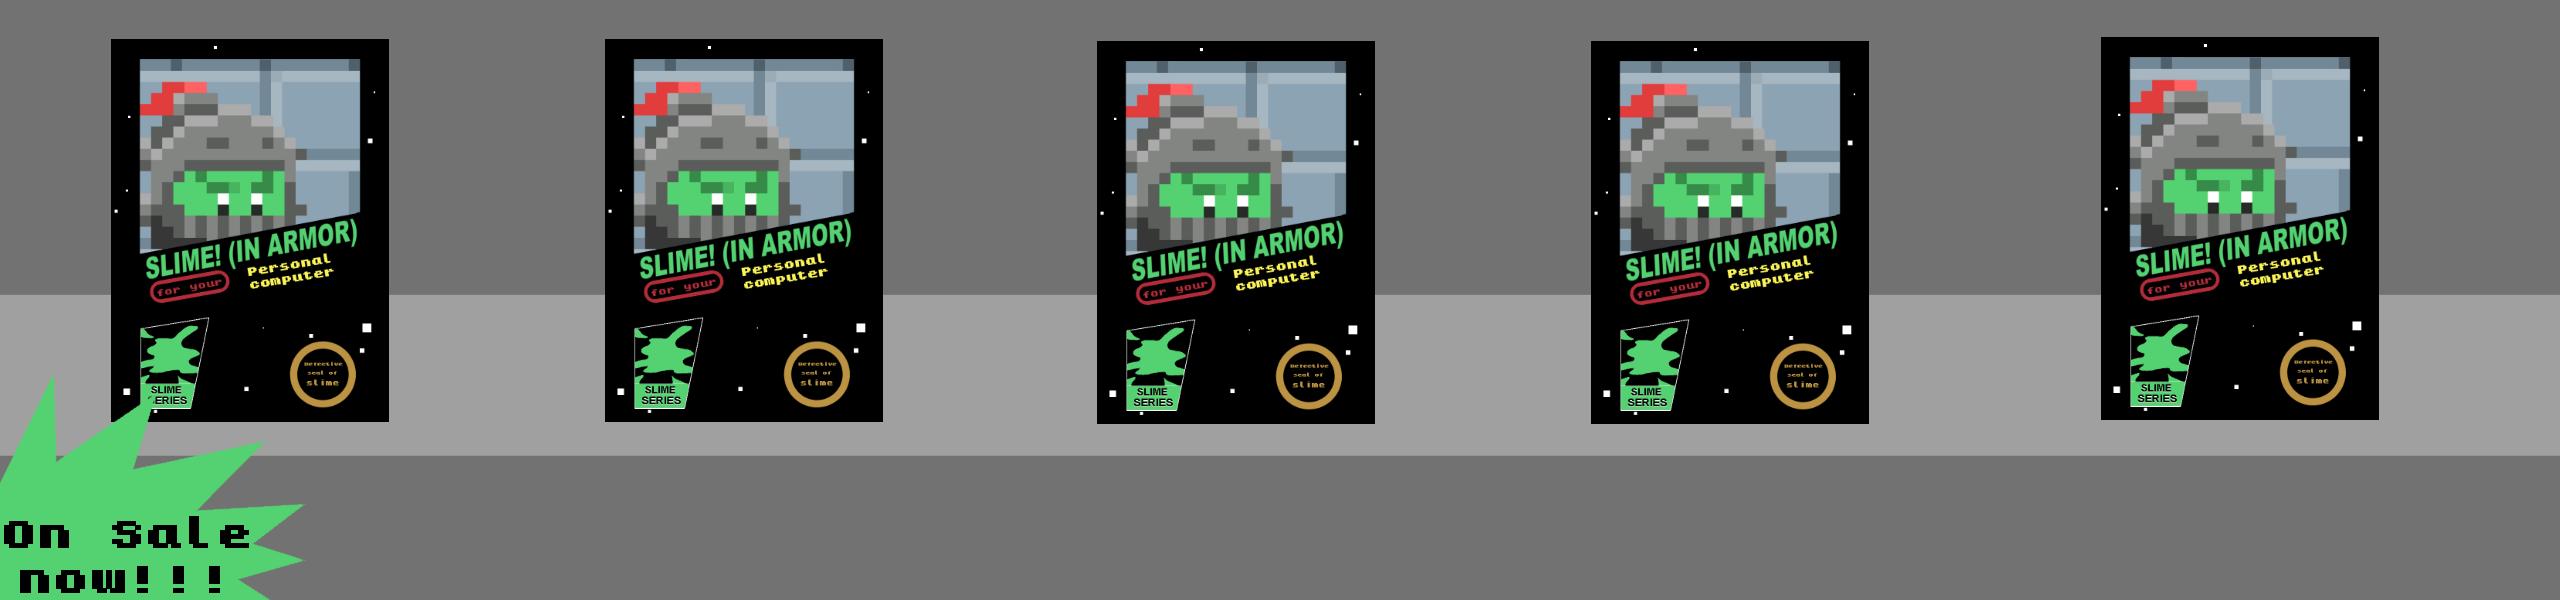 Slime! (In Armor)